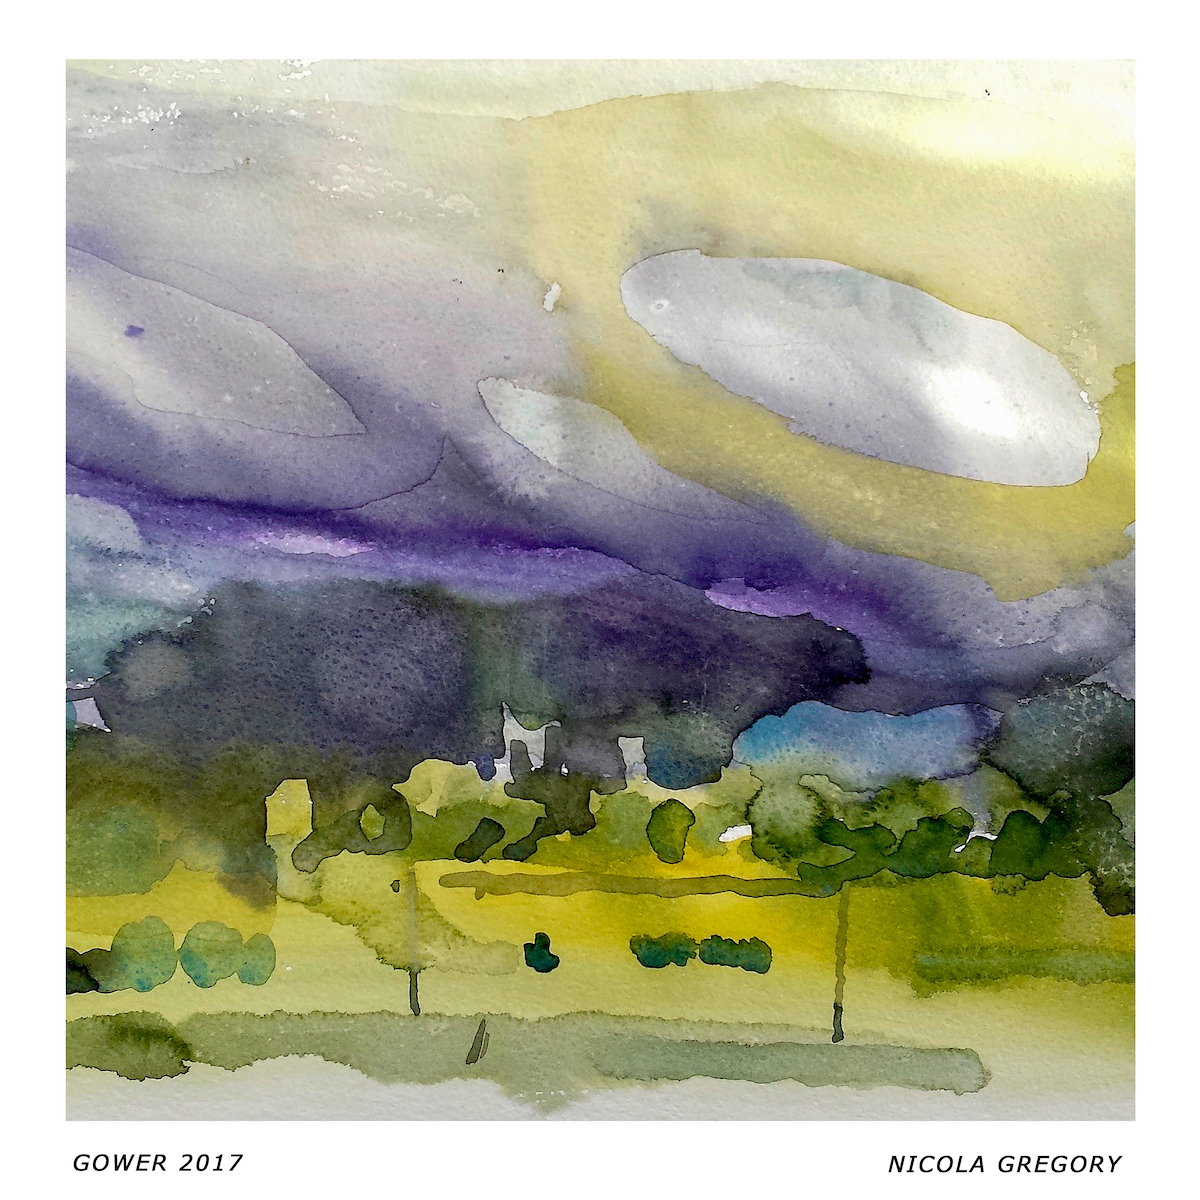 Gower 2017